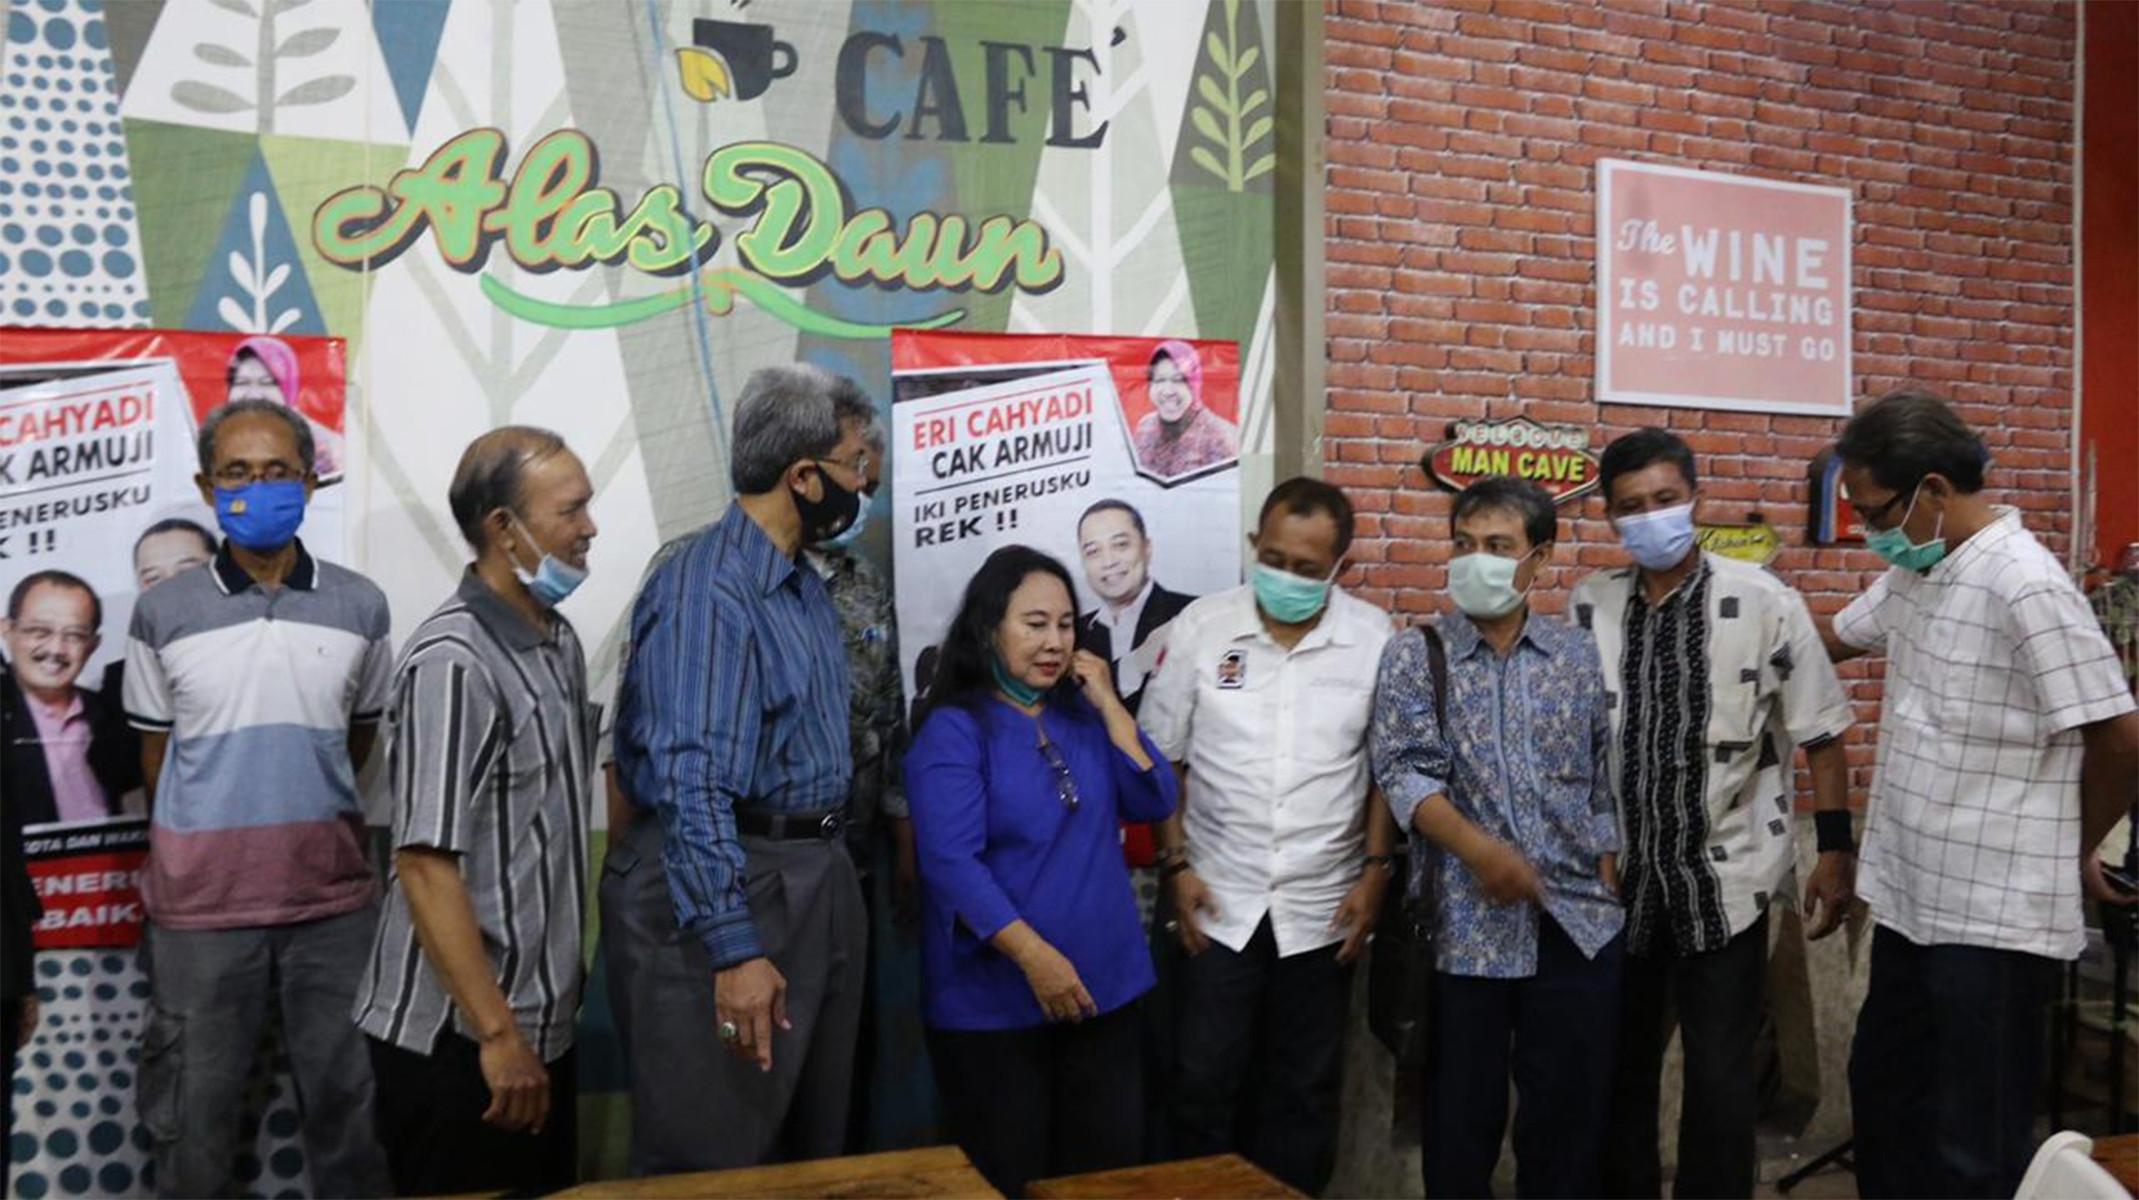 Alumni Teknik Sipil ITATS 4 Dekade Dukung Eri Cahyadi-Armuji Teruskan Program Risma - JPNN.com